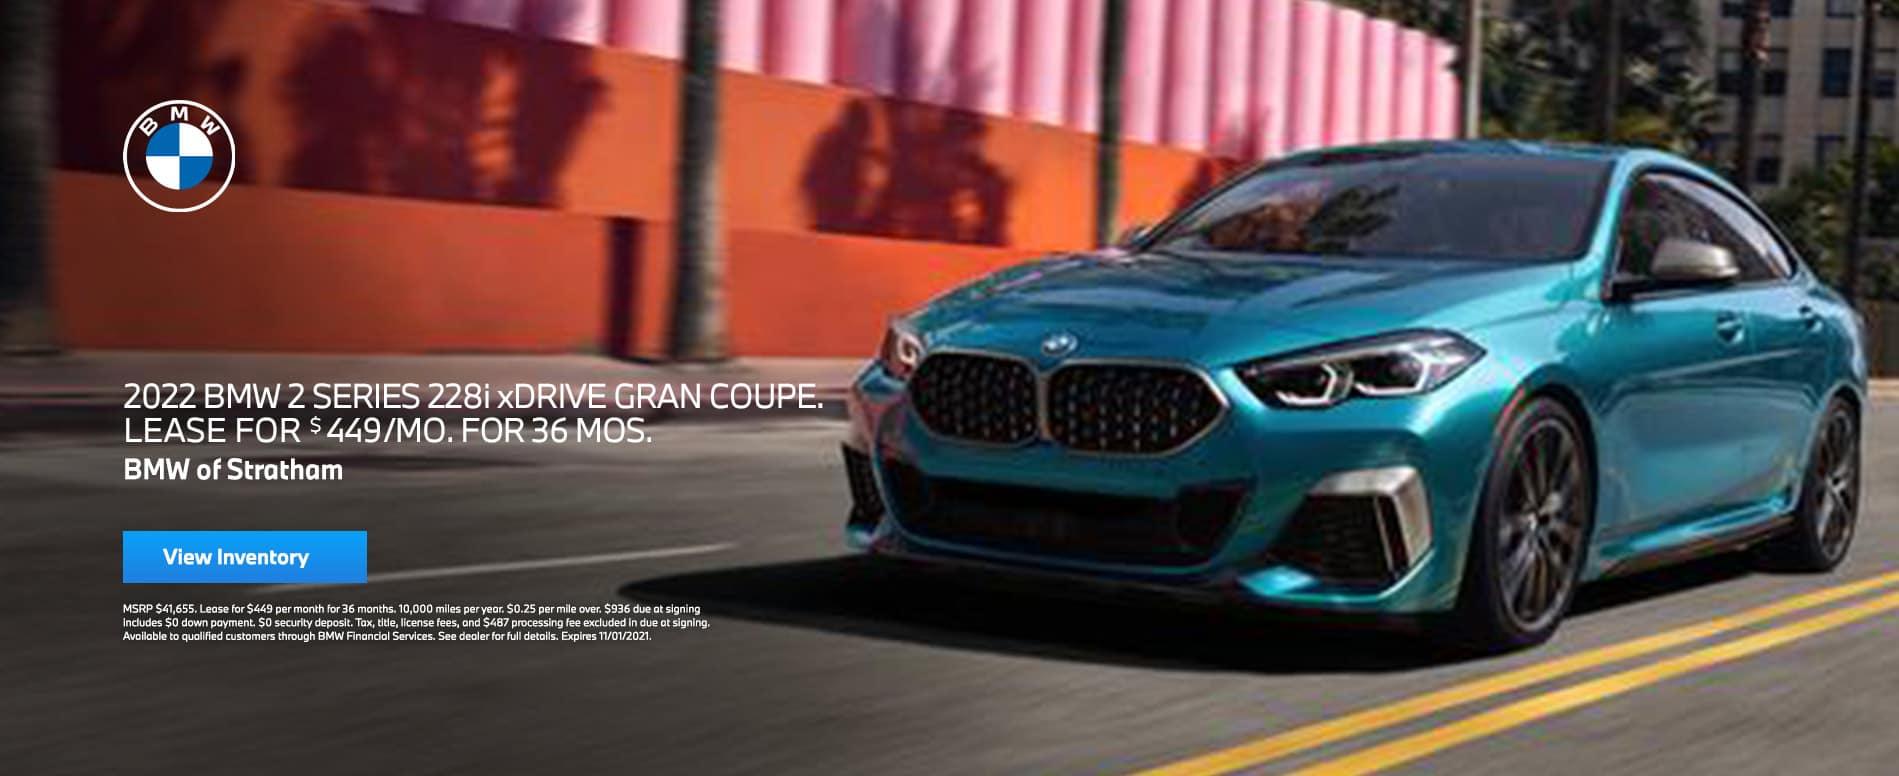 BMWAnnapolis_Slide_1990x776_2series_10-2021